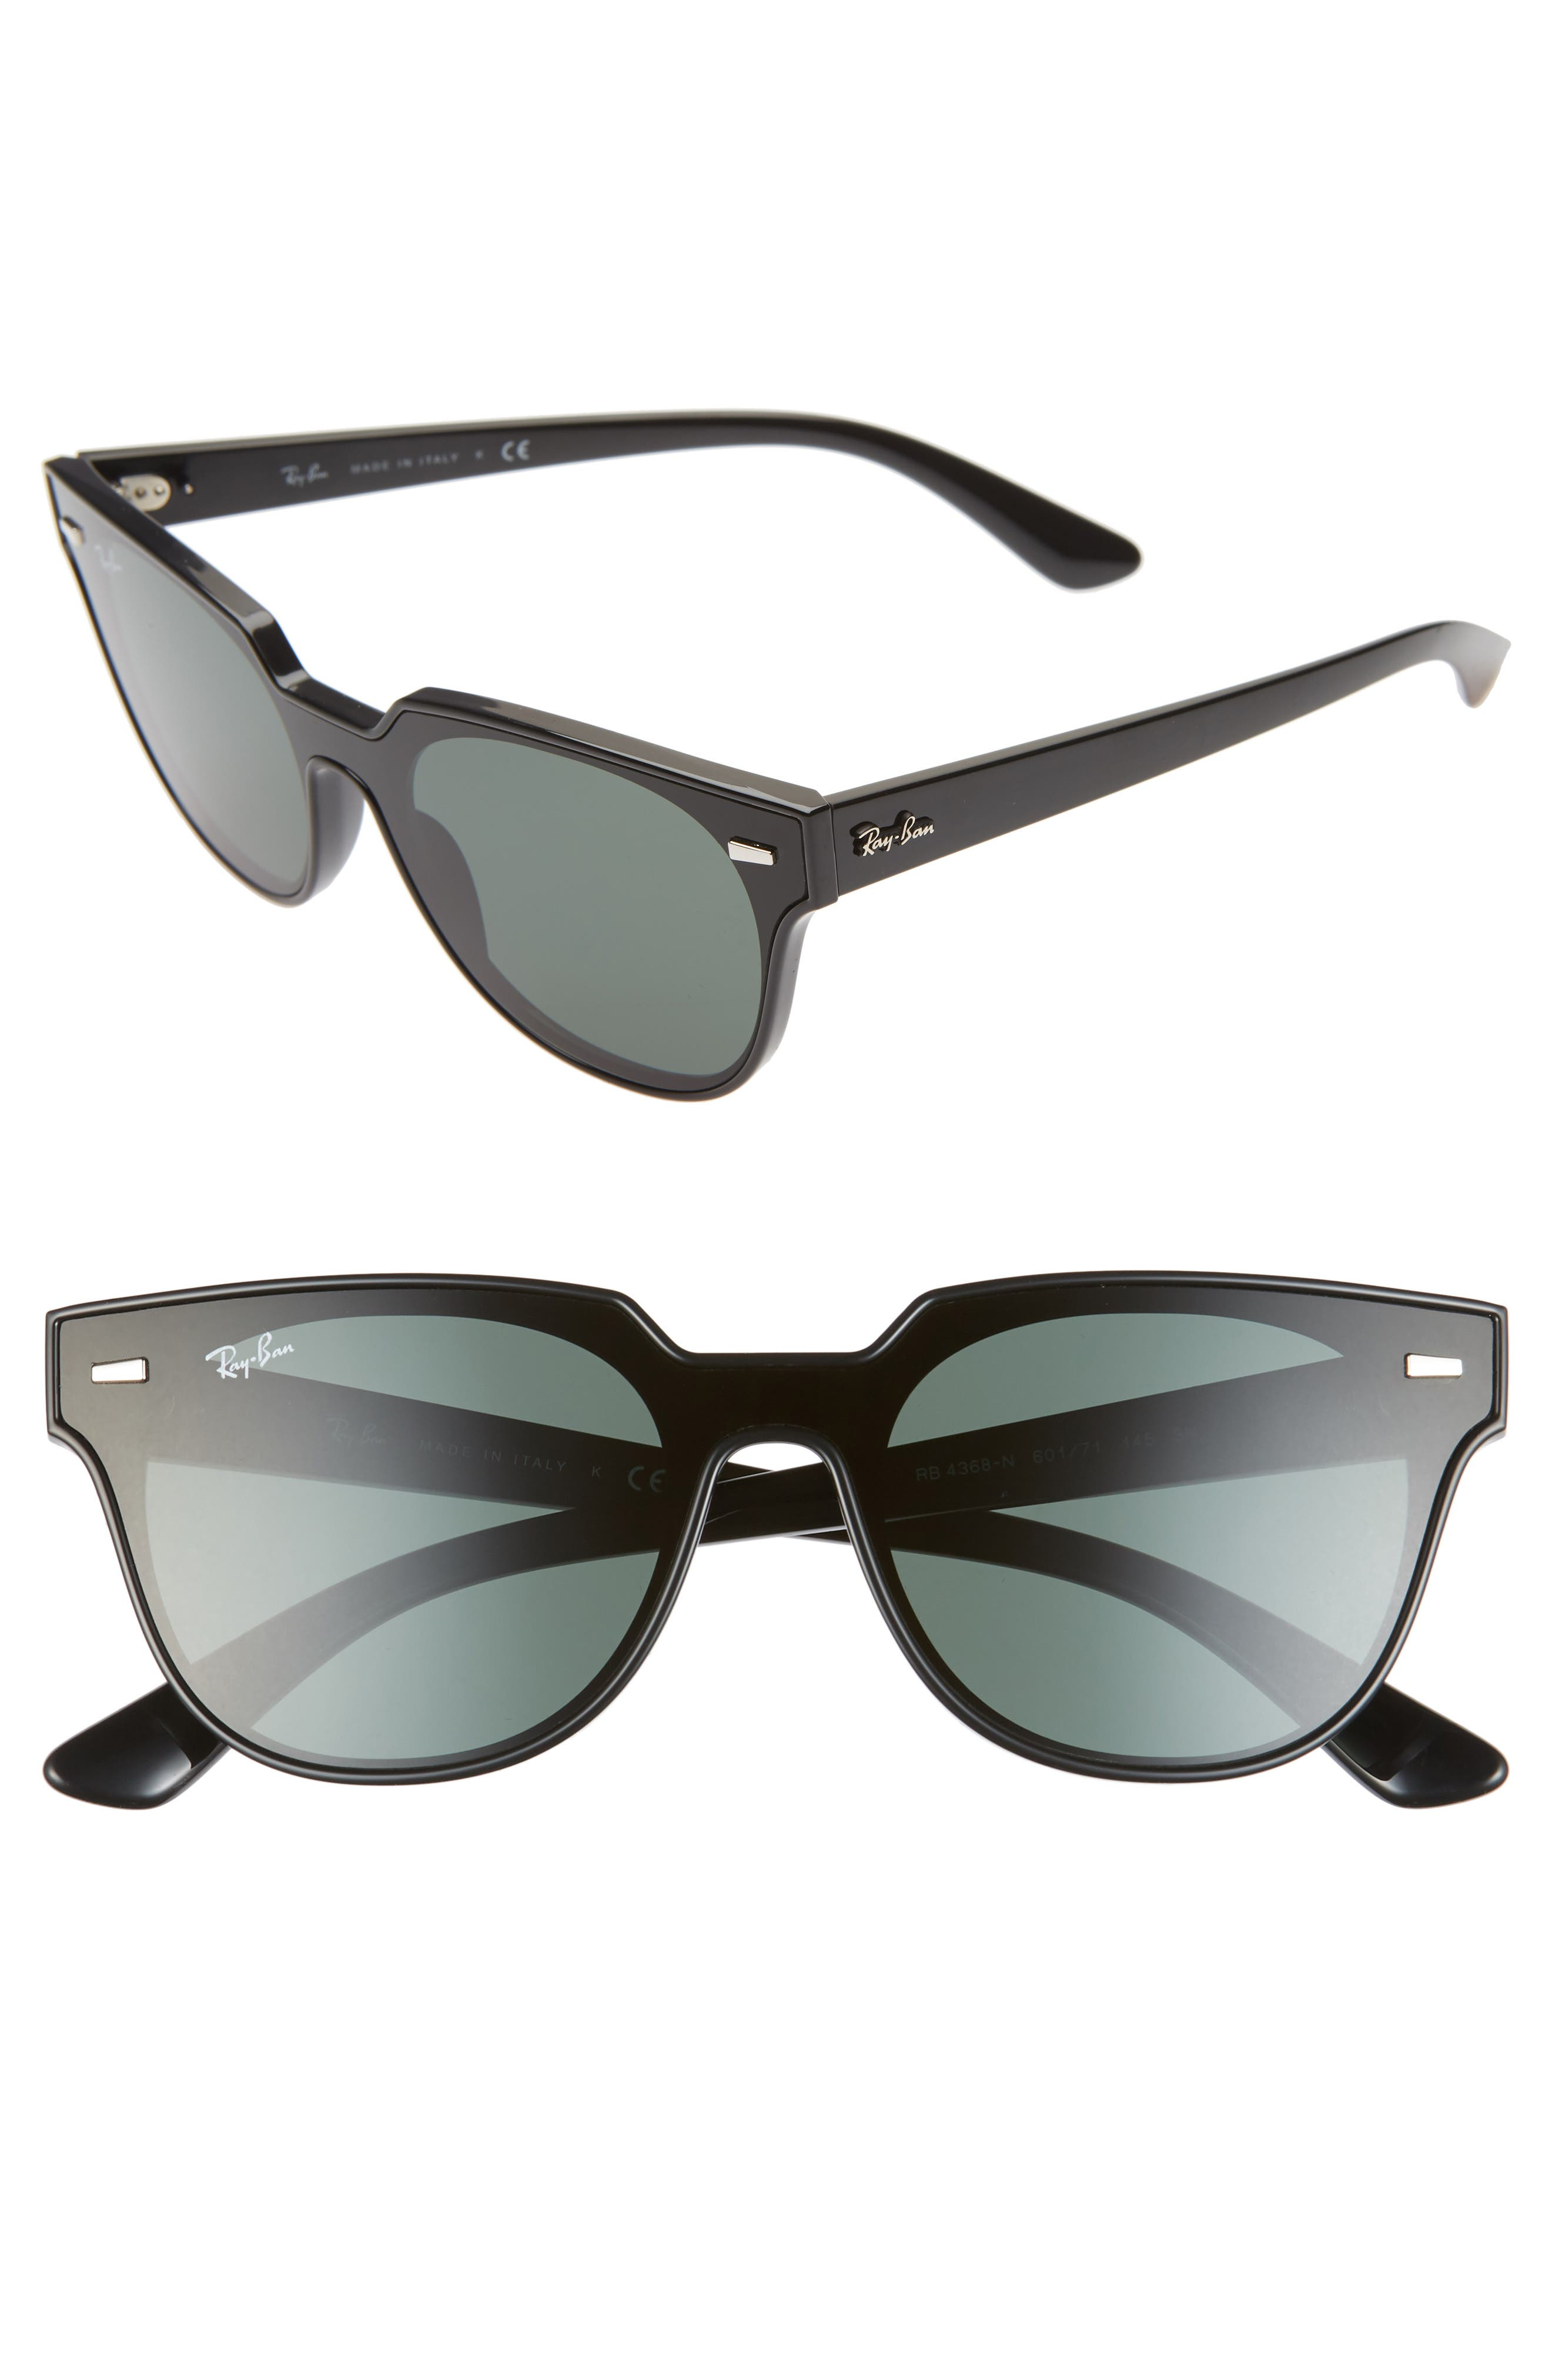 Ray-Ban Wayfarer 51Mm Sunglasses - Black